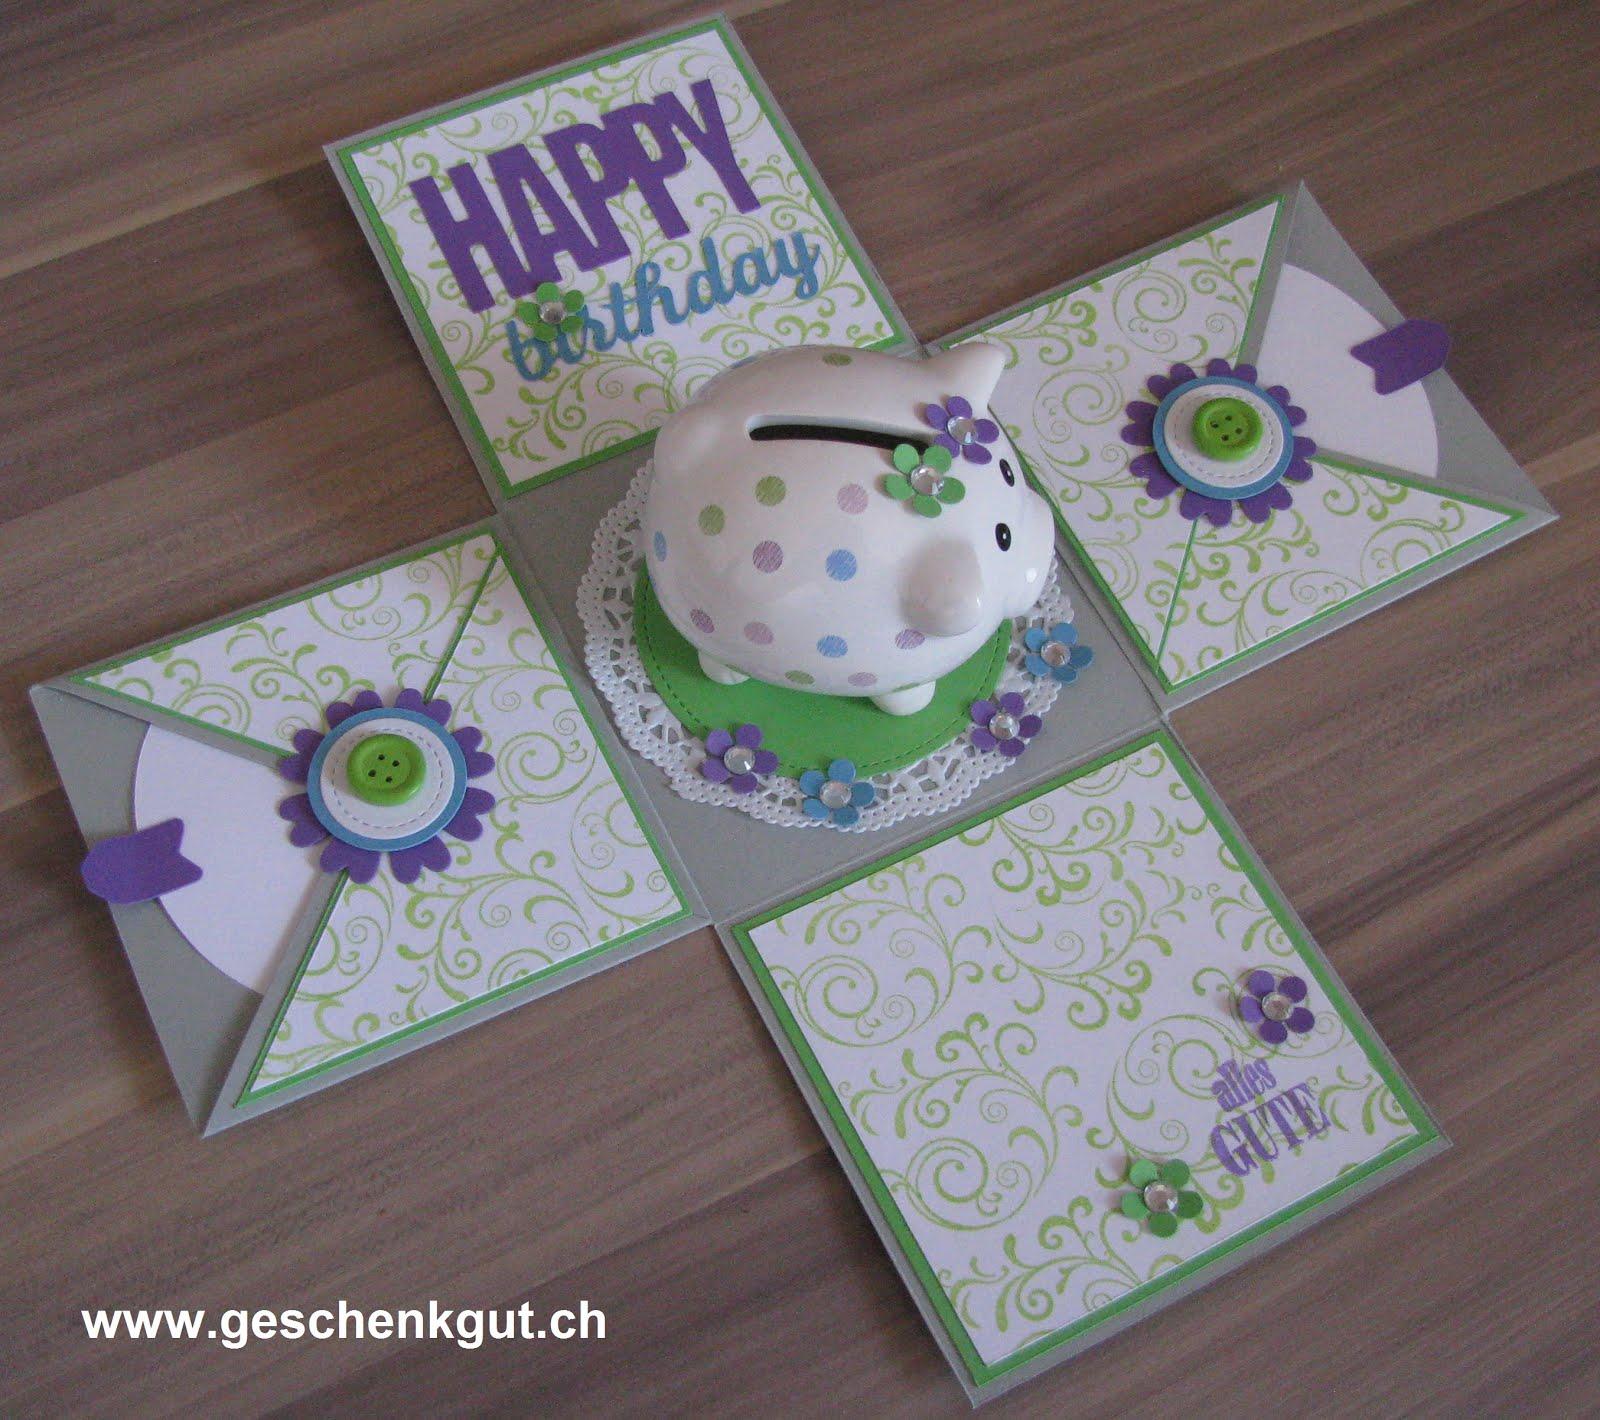 Geschenkgut shop geschenkverpackungen - Geschenk zum 25 geburtstag selber machen ...